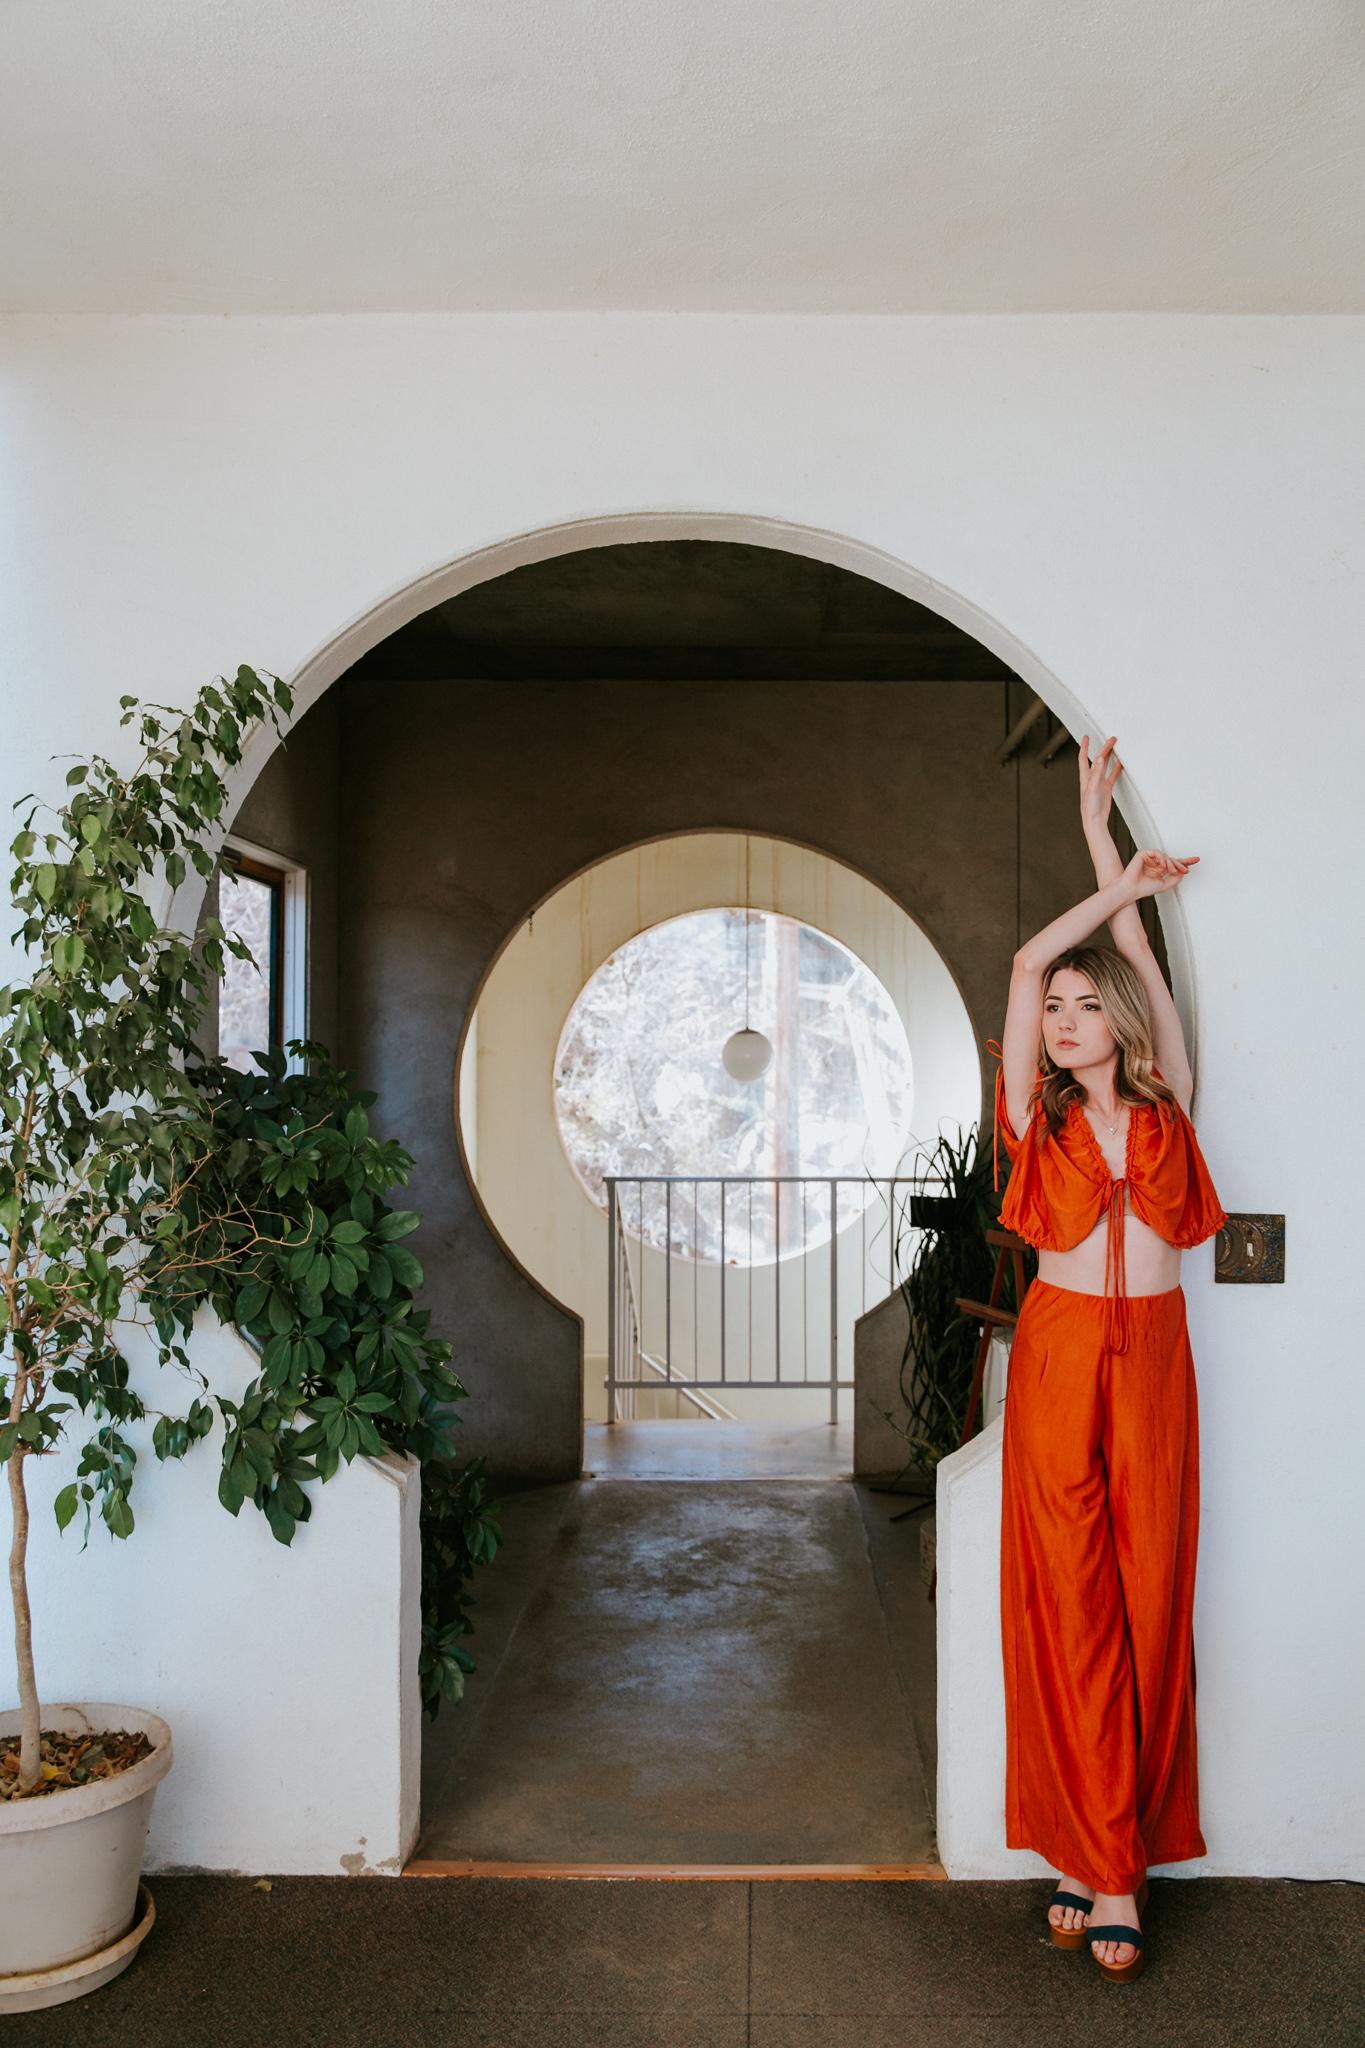 ChelseaScottEvans-Arcosanti-016.jpg